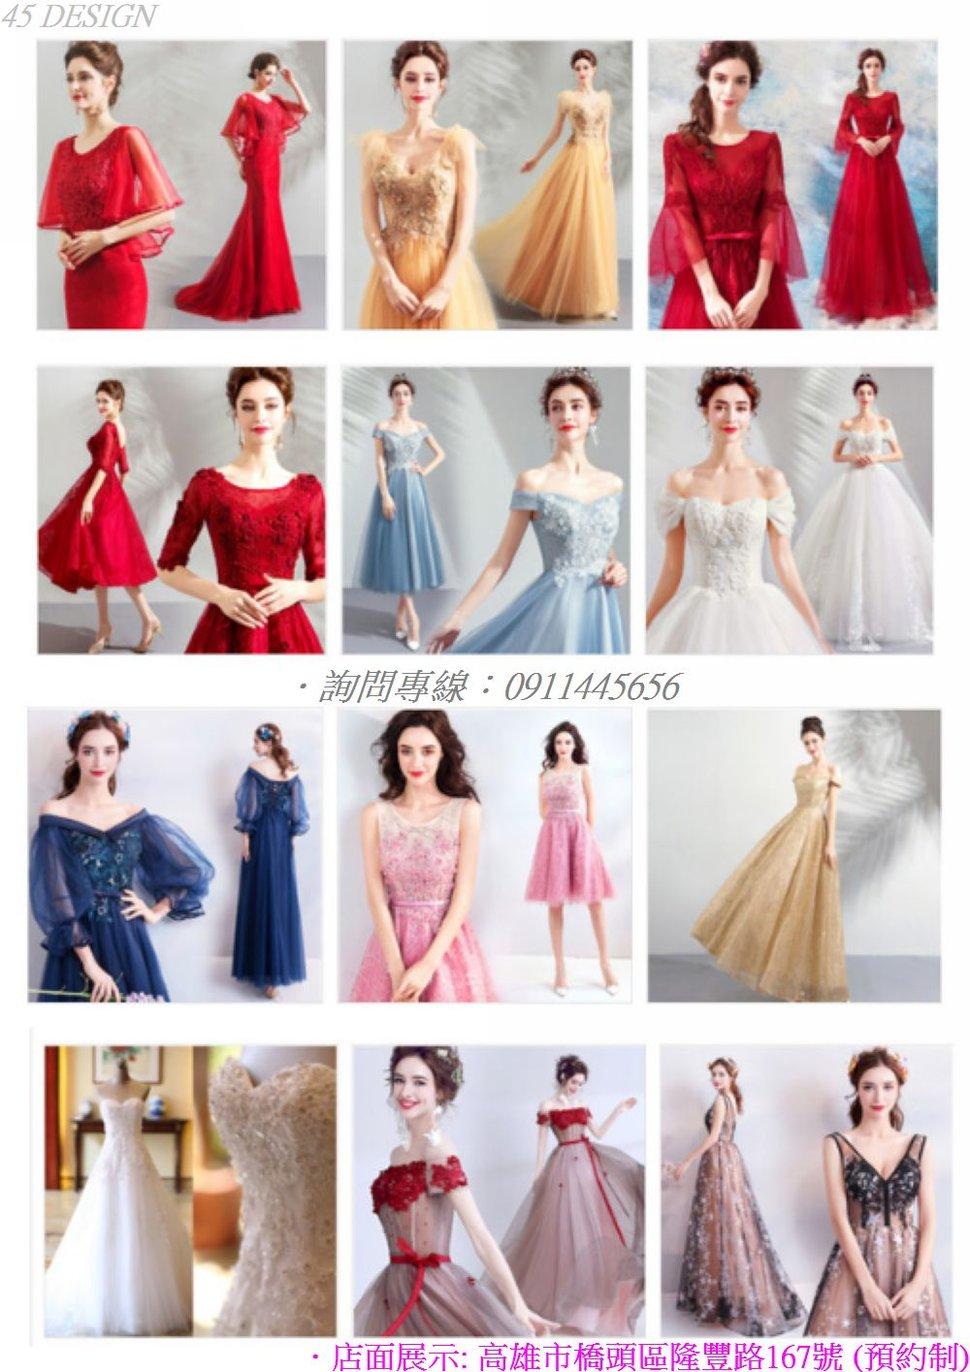 msl190815EBAE77D18BEE4364AFACDCC3DDC414DD - 全台最便宜-45DESIGN四五婚紗禮服《結婚吧》